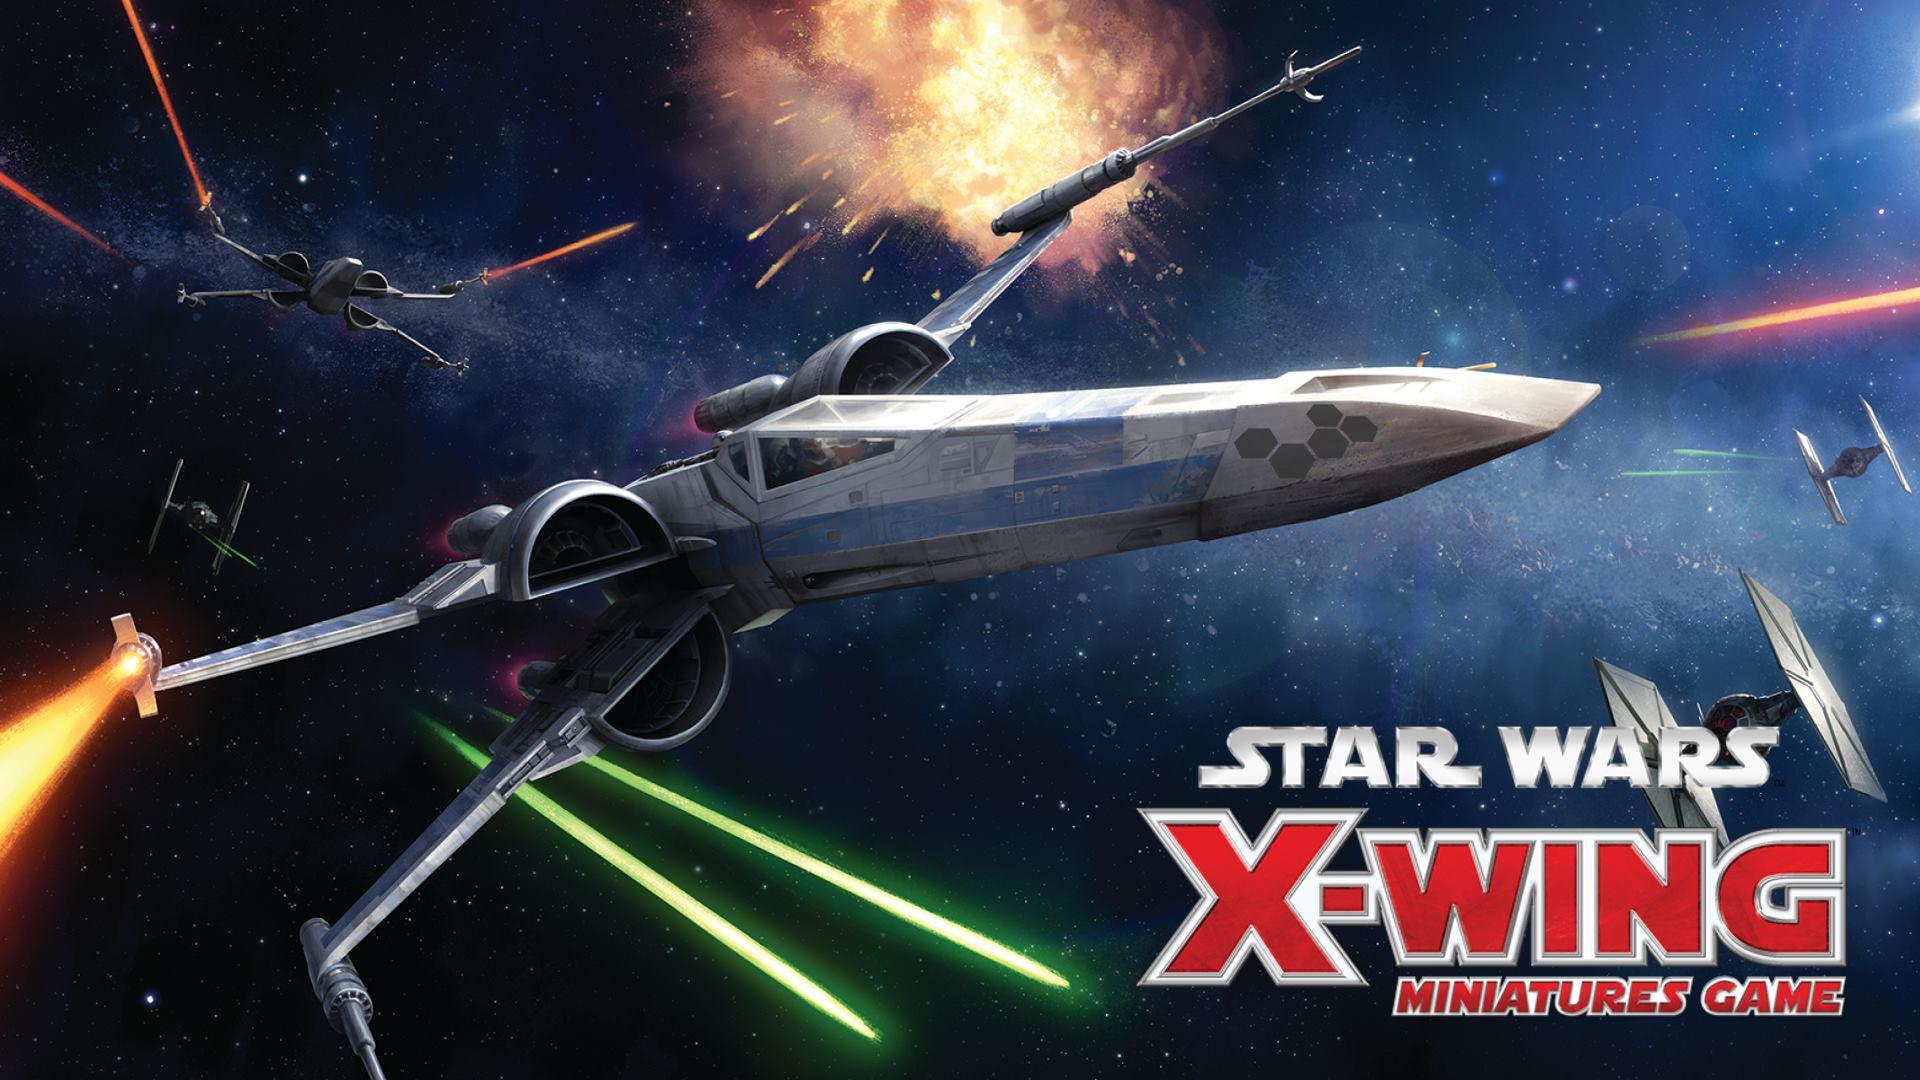 X-Wing Event Image.jpg